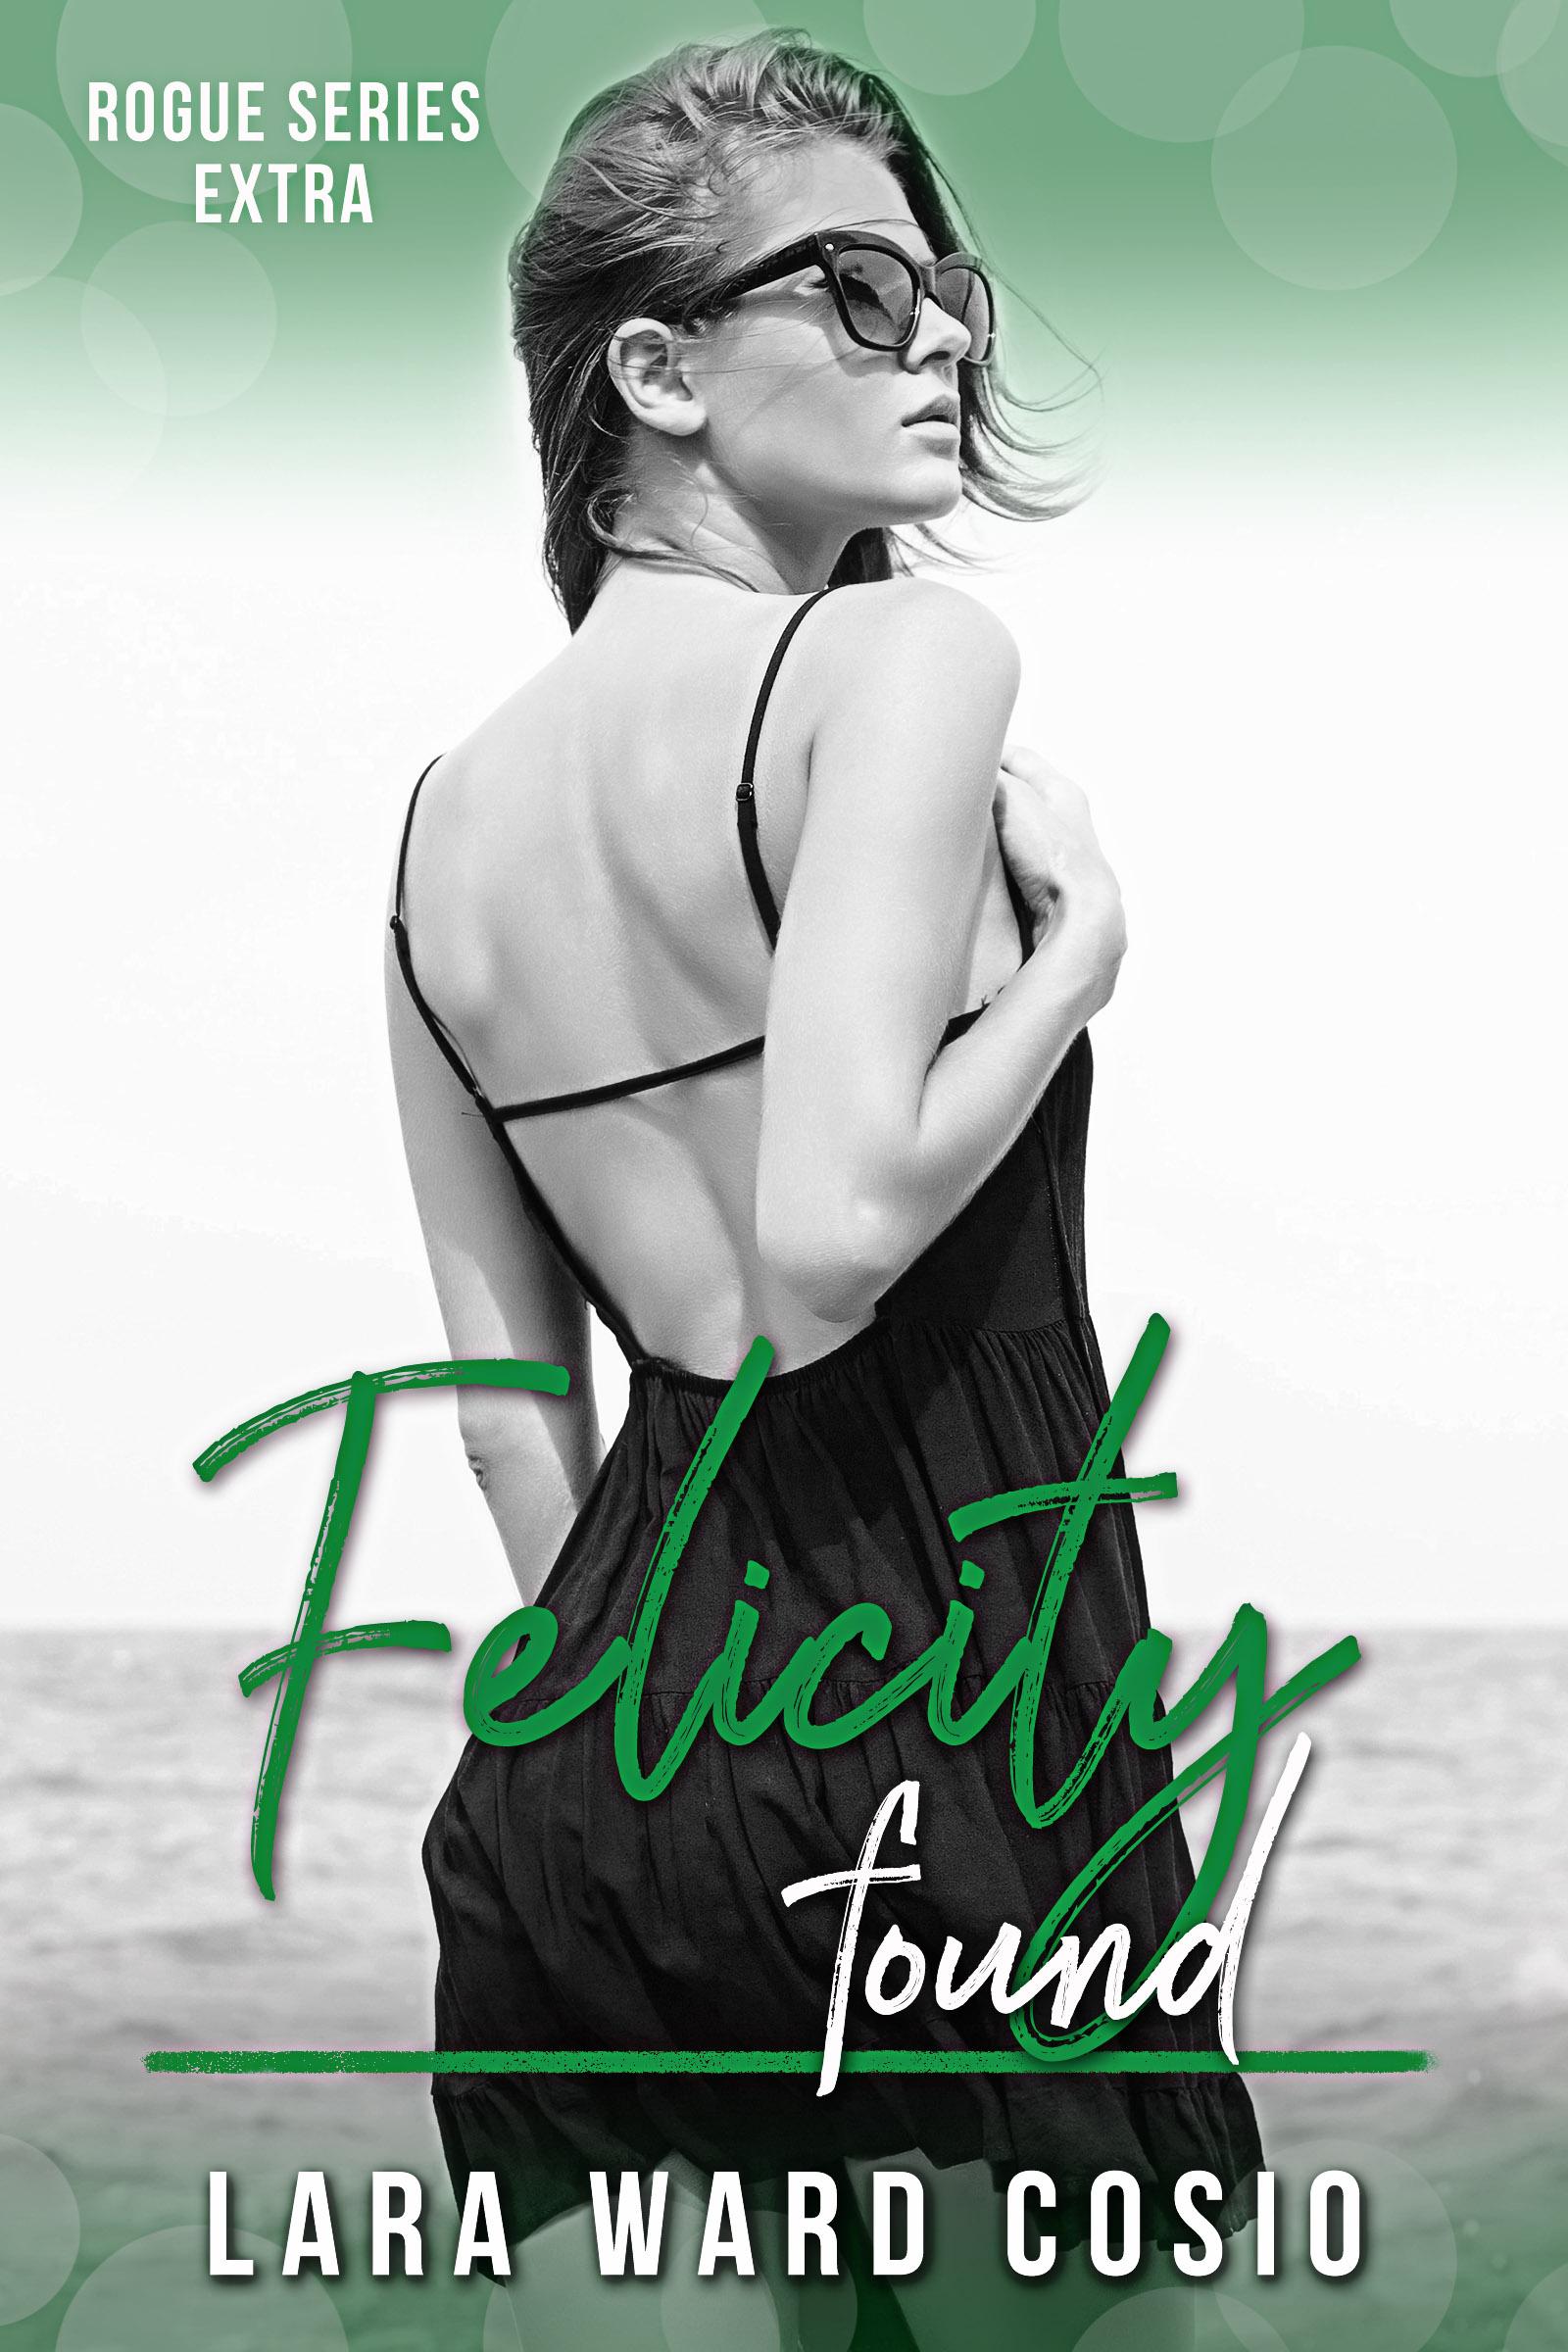 Custom Book Cover, Contemporary Romance, Lara Ward Cosio, Rogue Series